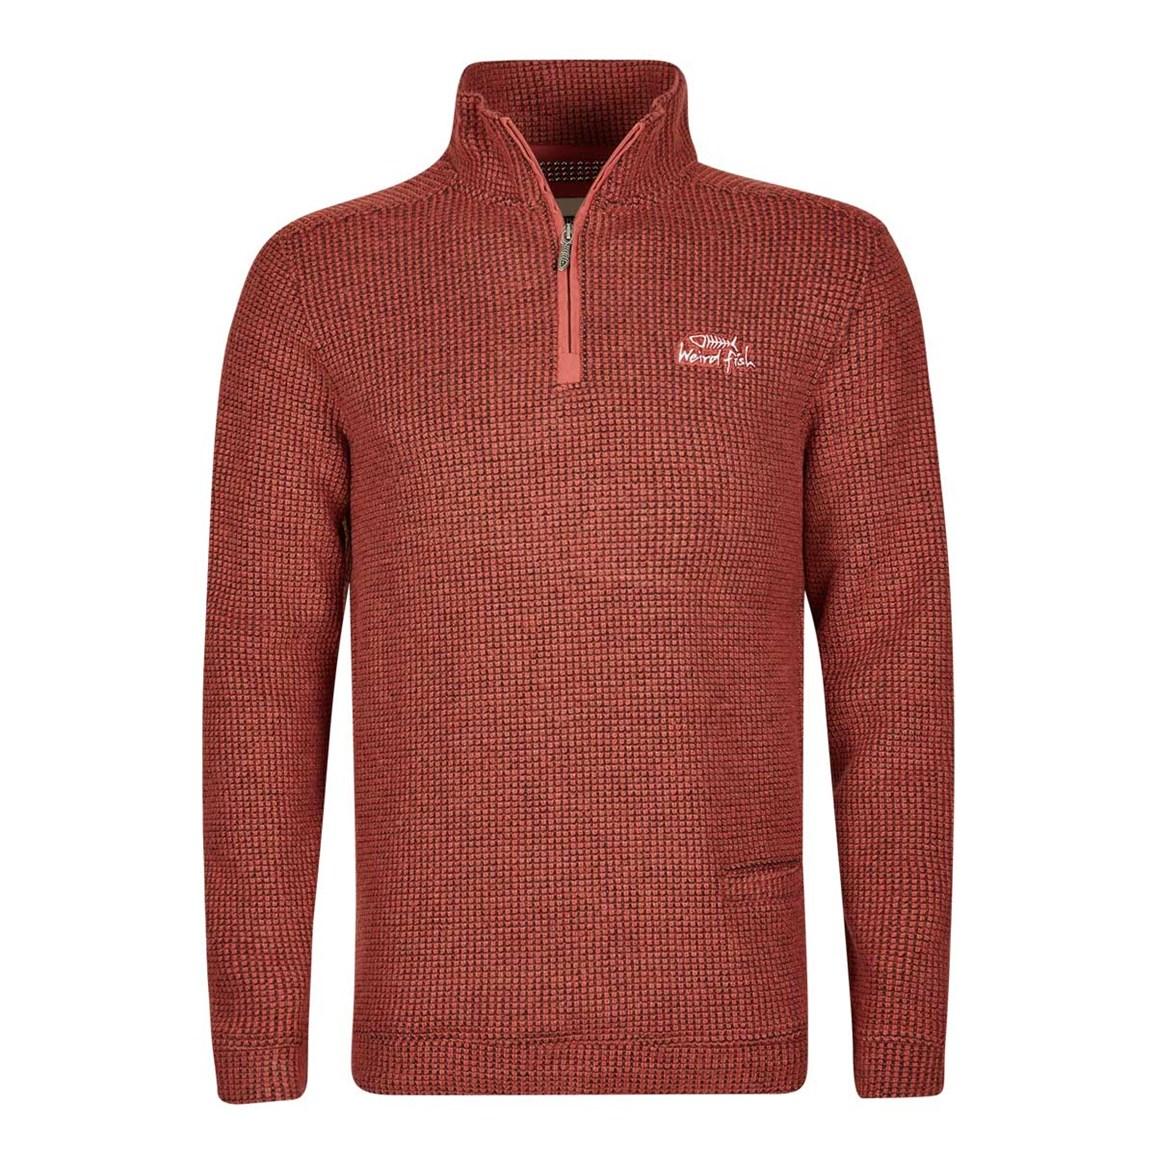 Image of Weird Fish Tindal Textured 1/4 Zip Soft Knit Fleece Sweatshirt Baked Apple Size XL